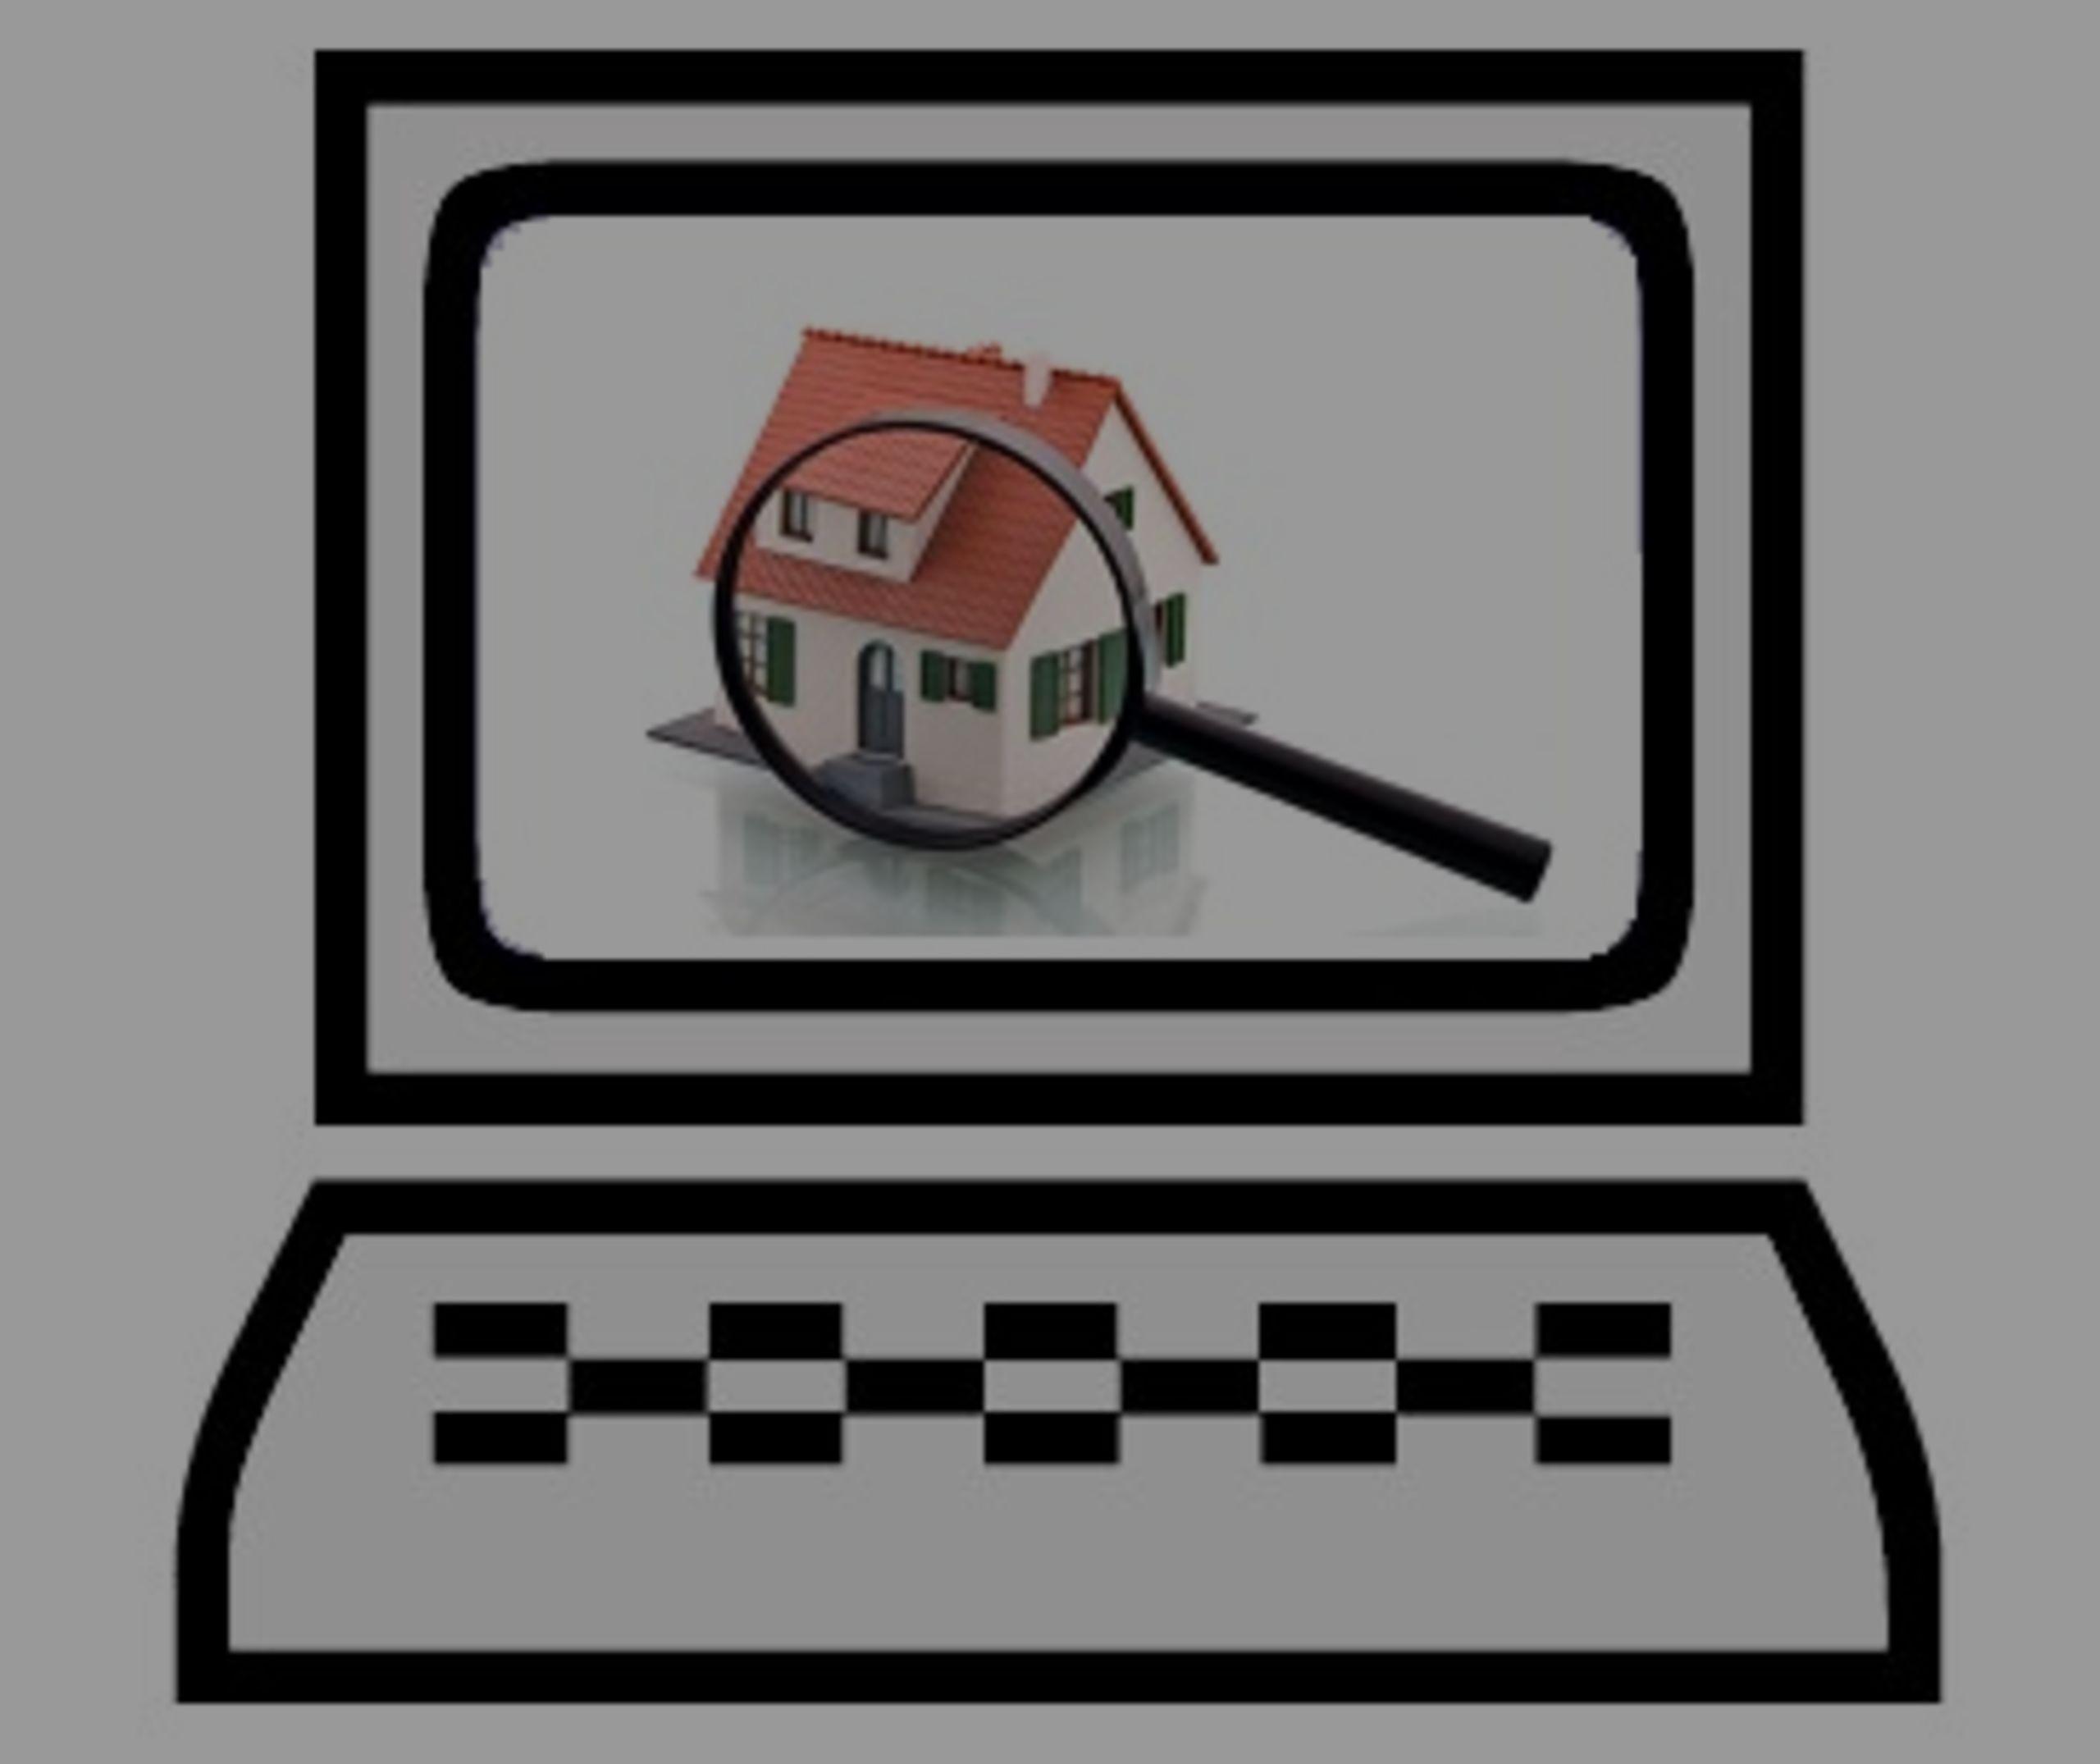 Are Online Home Value Estimates Accurate?